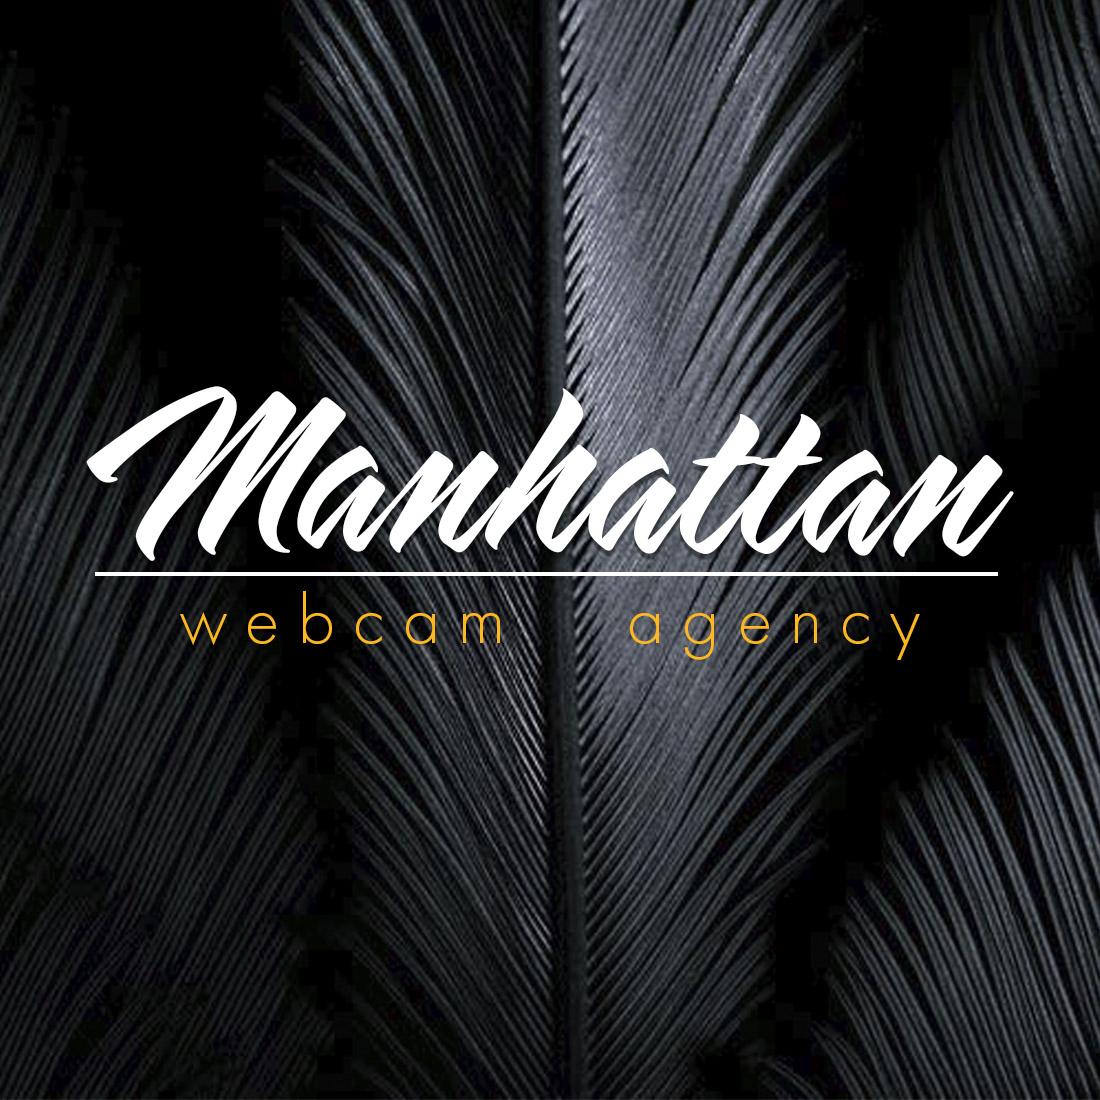 вебкам студия Manhatthan